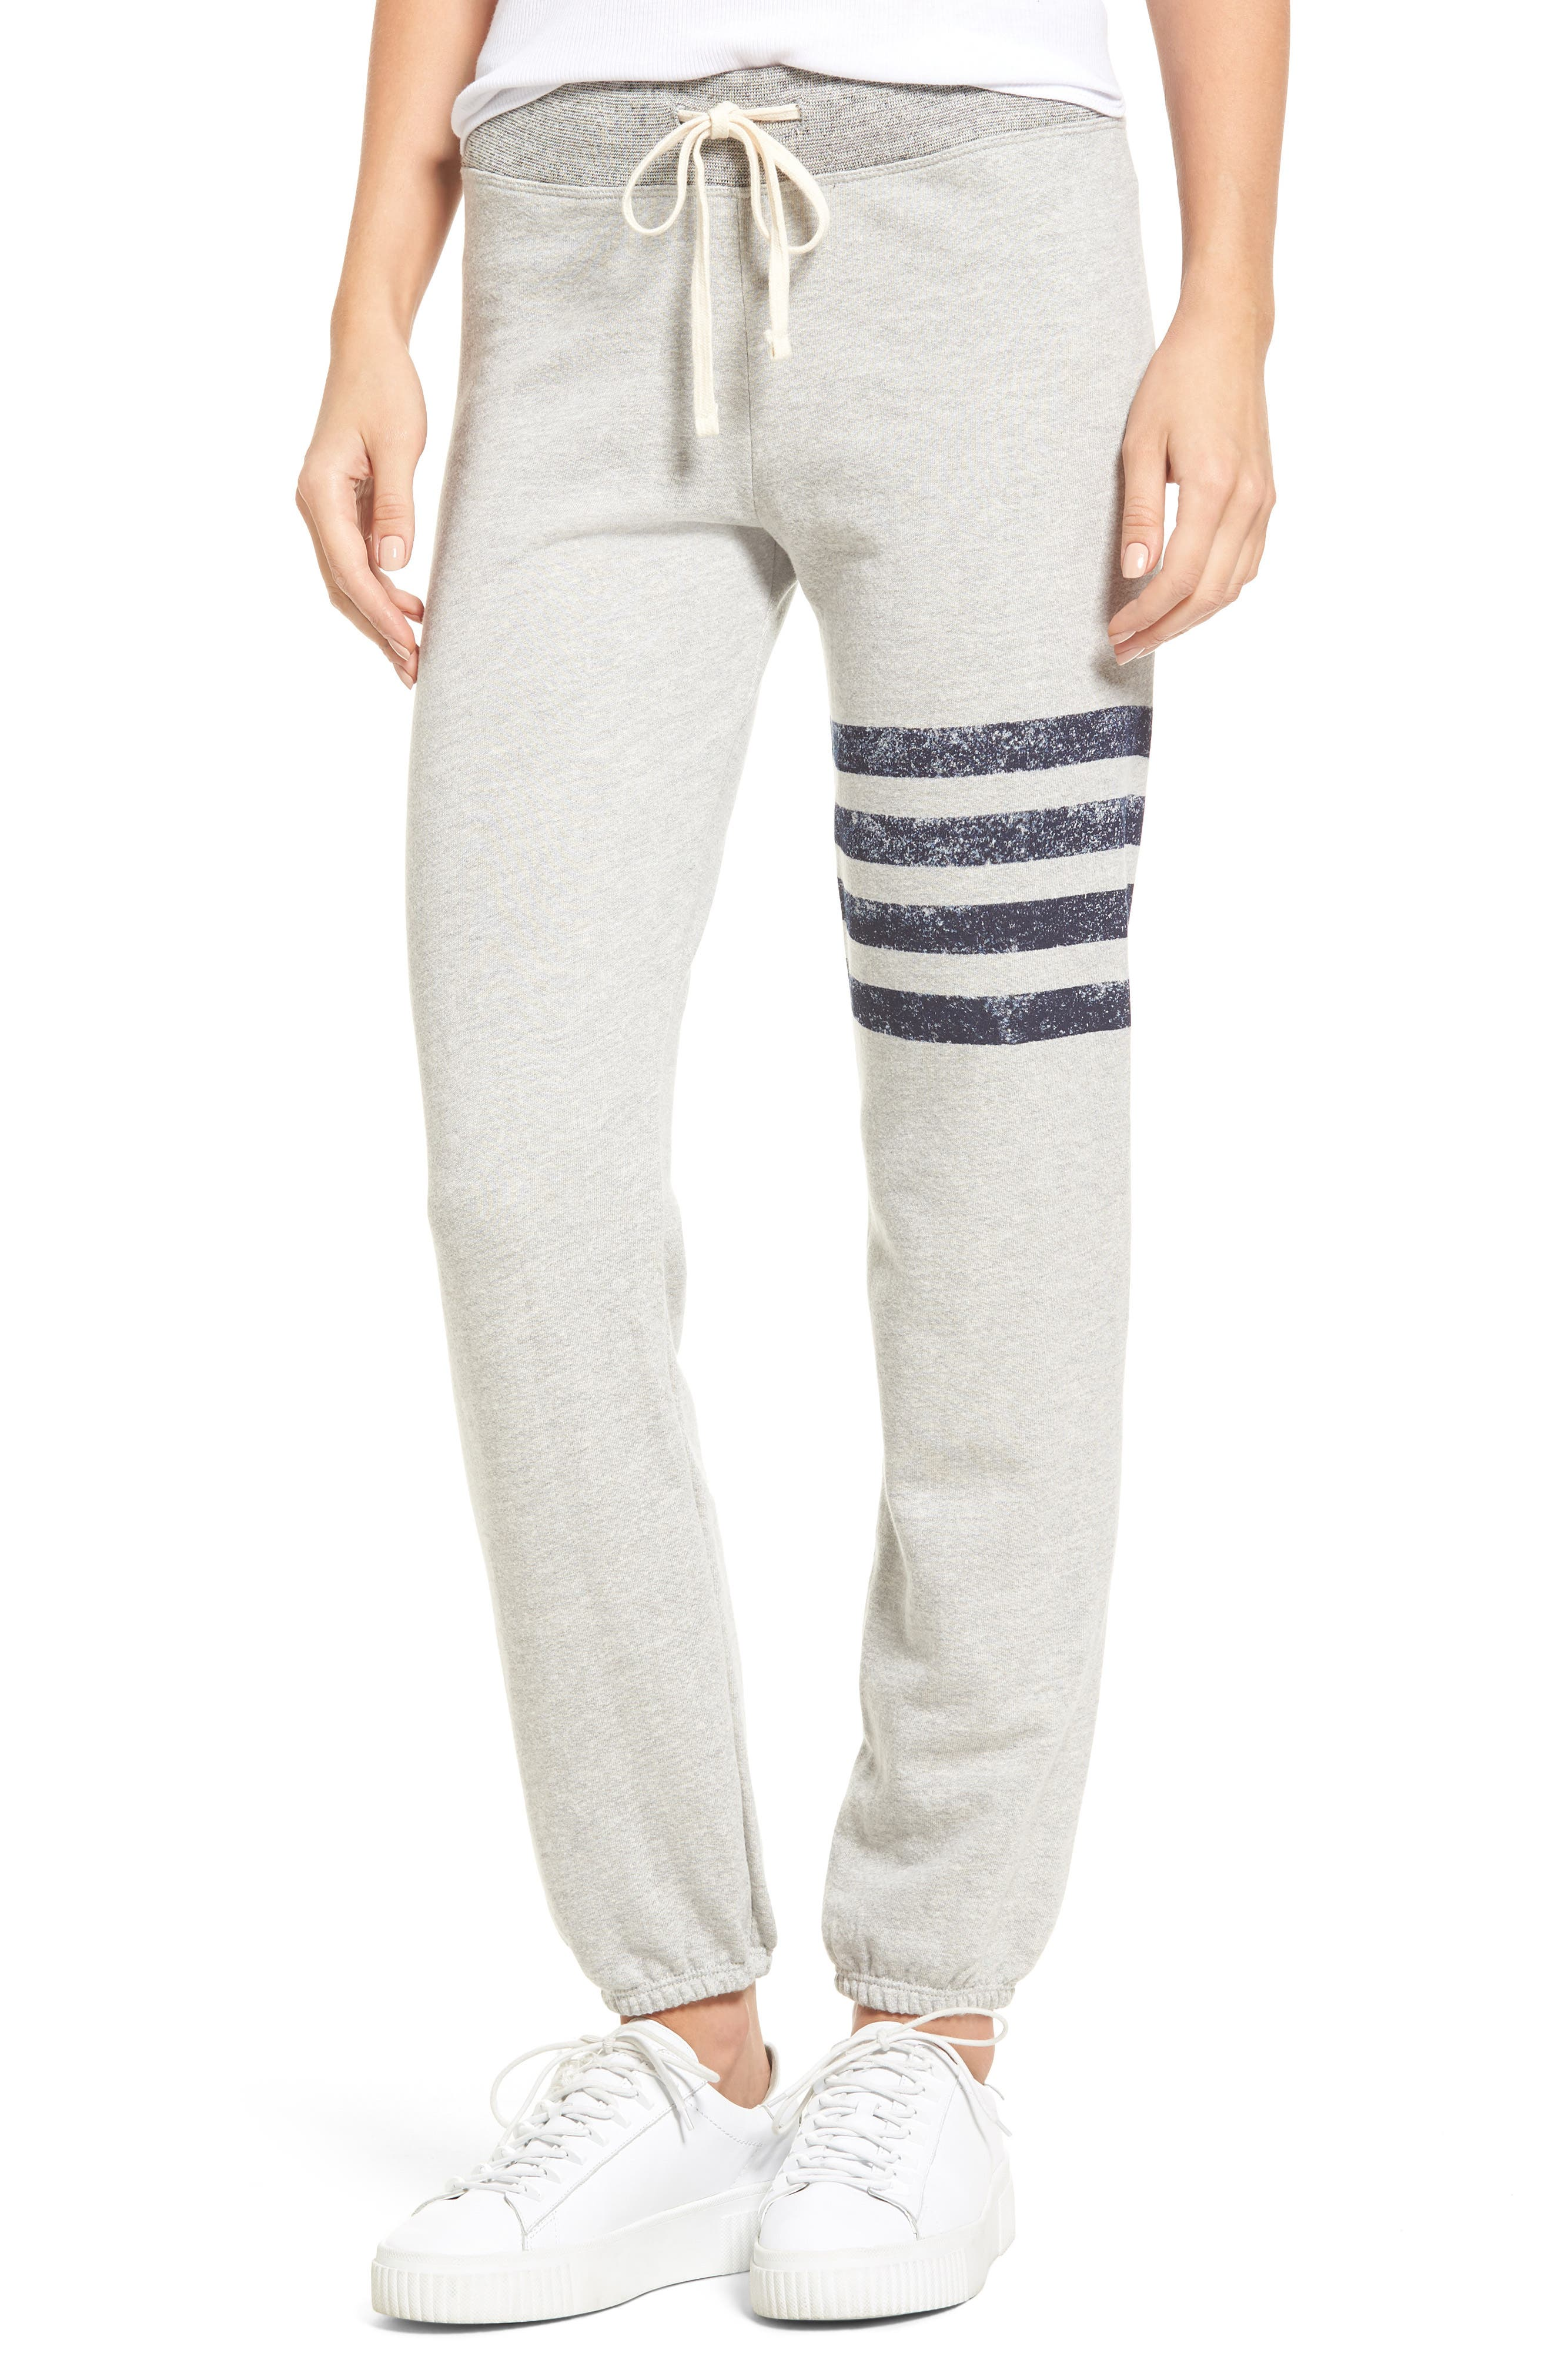 Stripe Yoga Pants,                             Main thumbnail 1, color,                             001